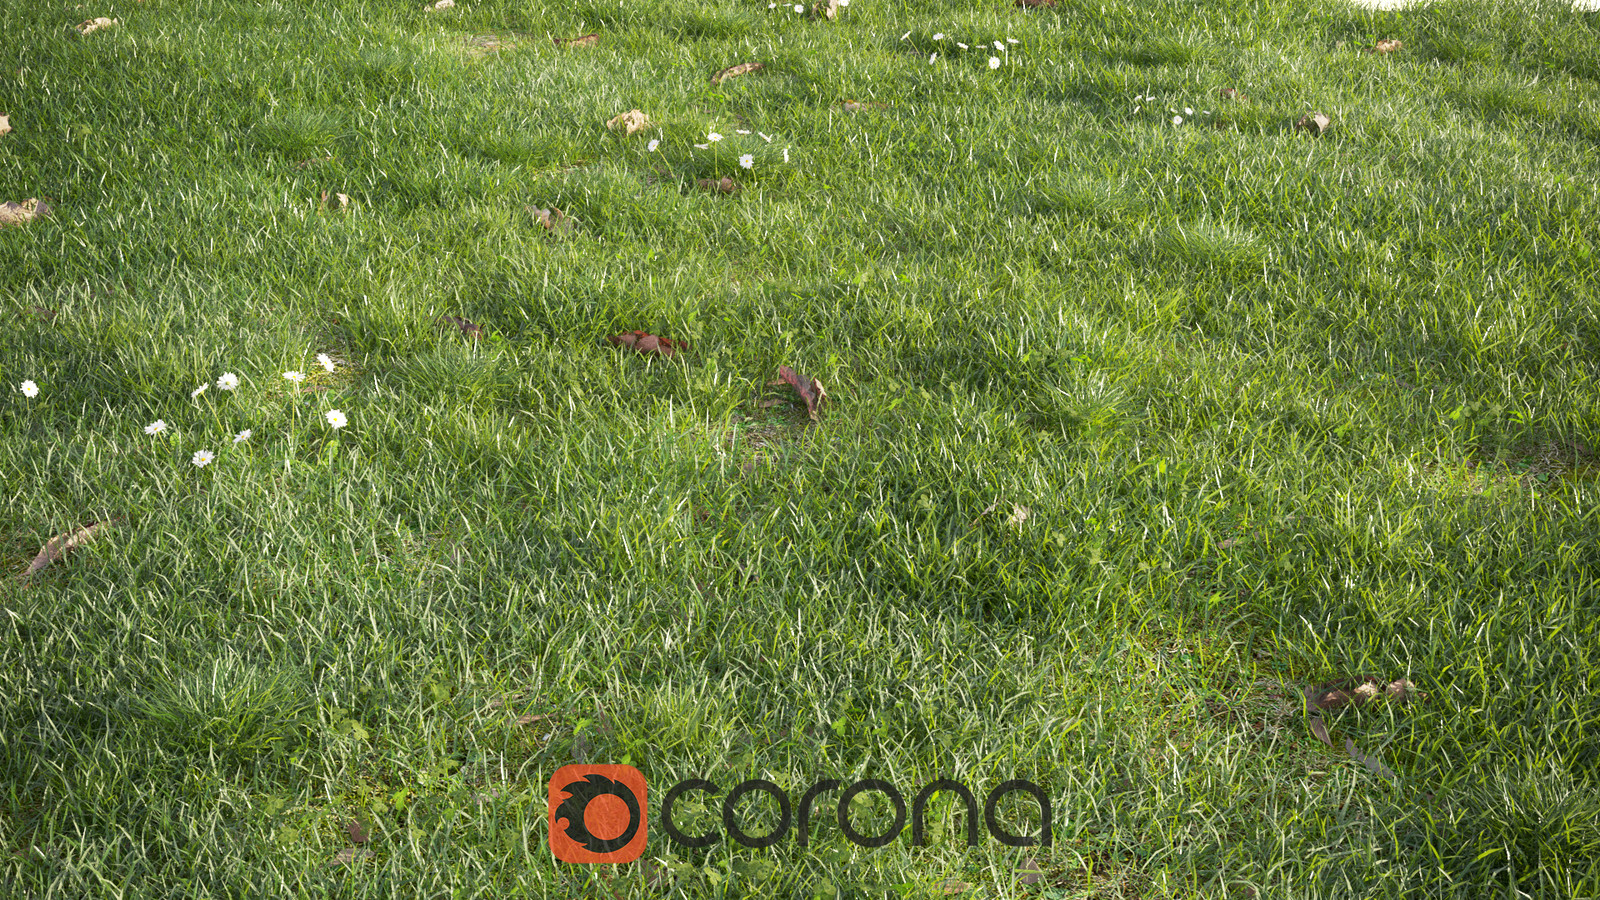 Corona Renderer - Realistic Grass